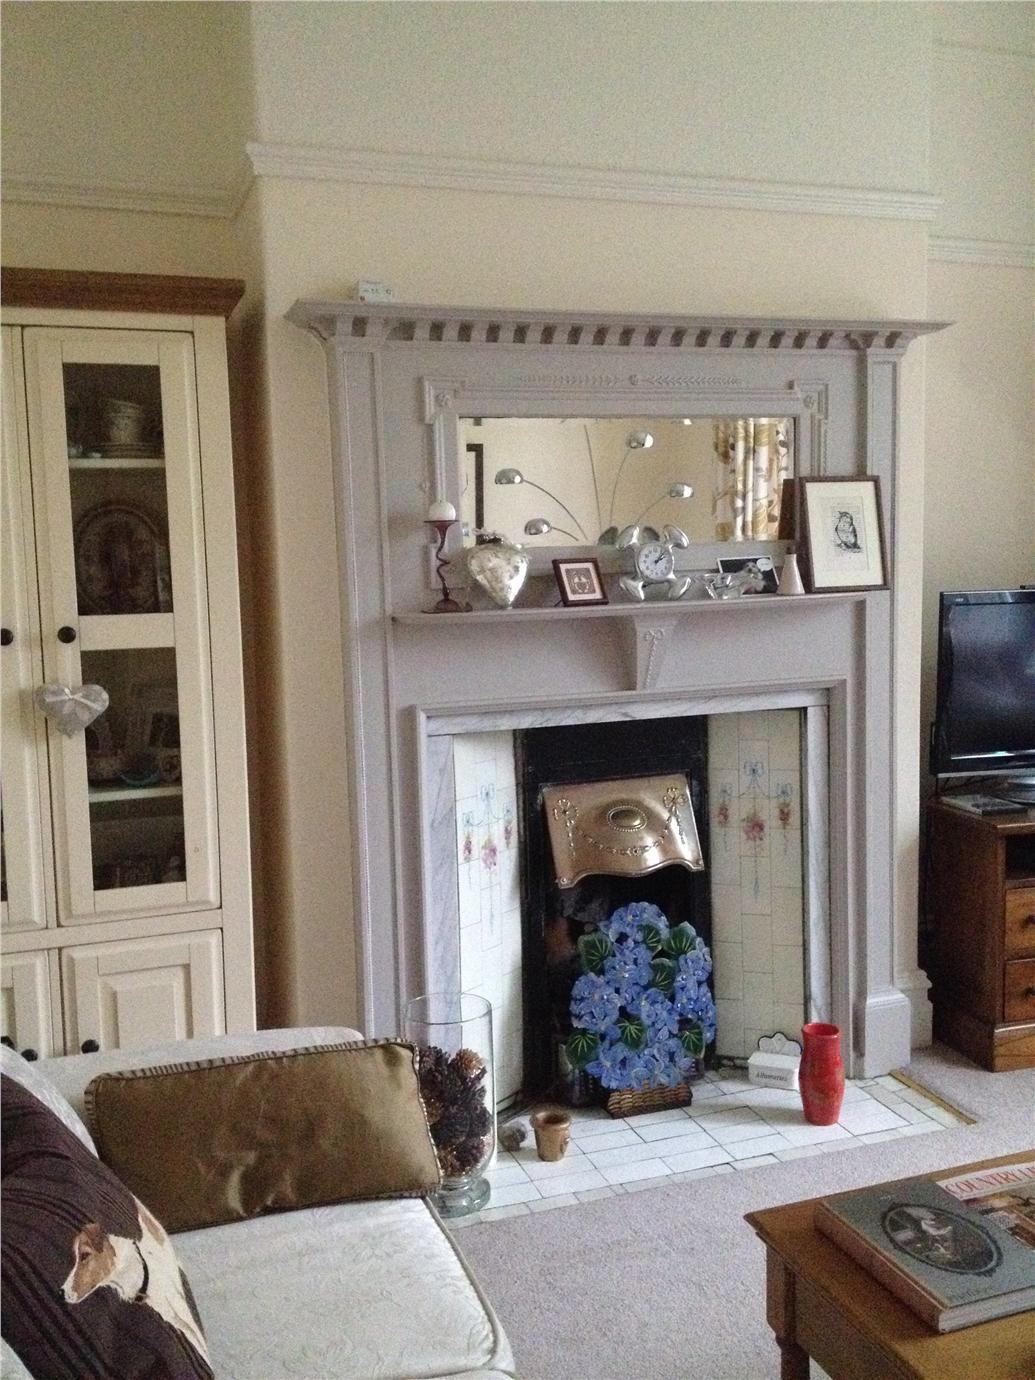 farrow ball tallow 203. Black Bedroom Furniture Sets. Home Design Ideas